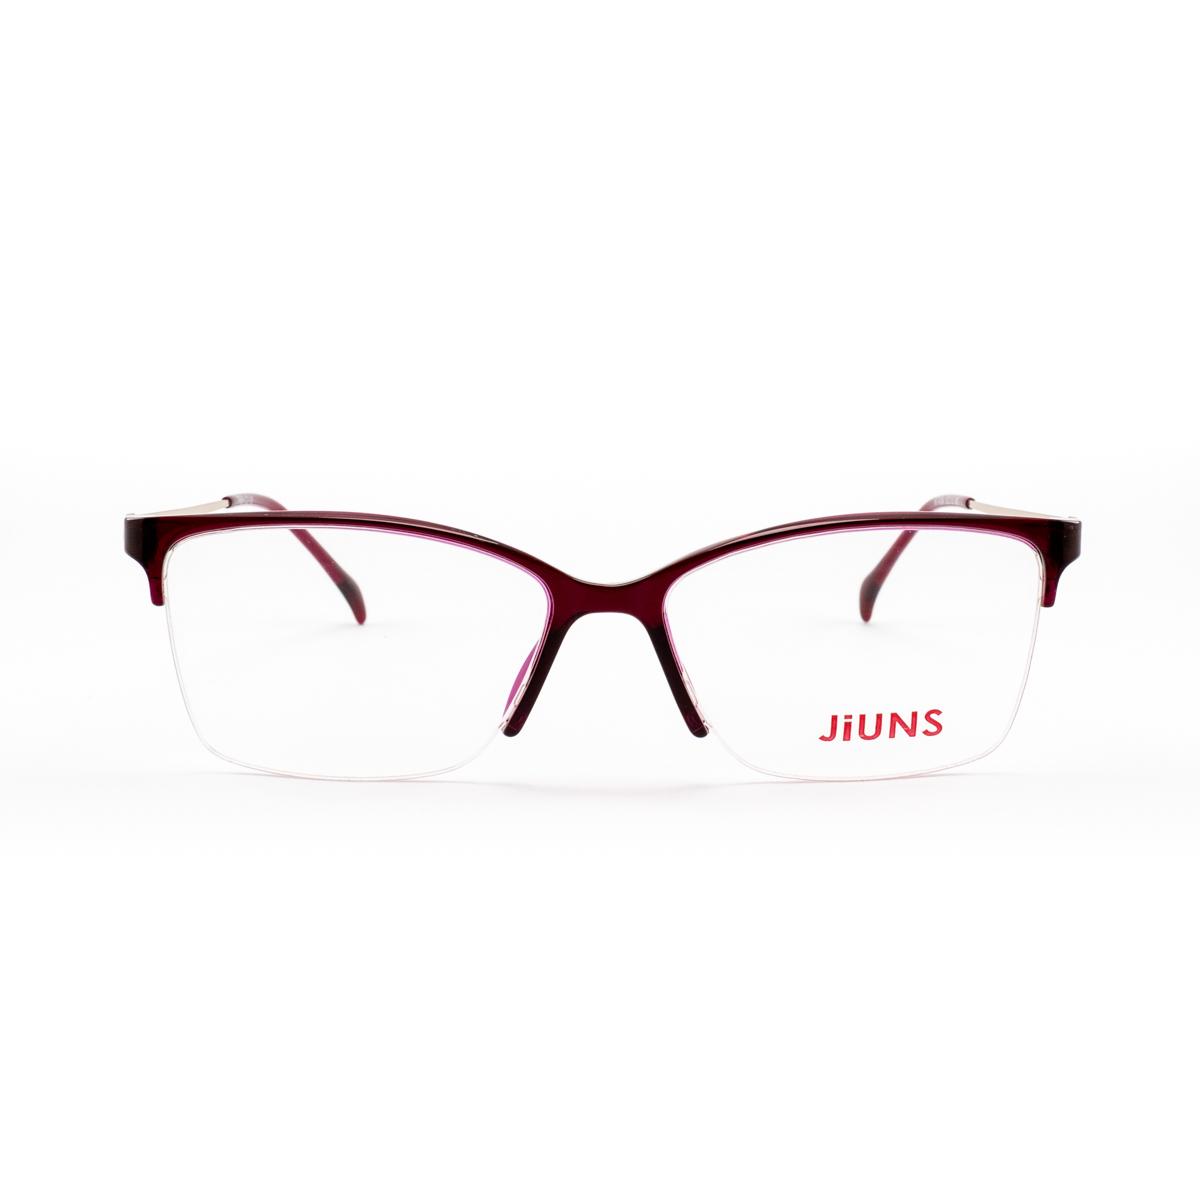 JiUNS MT4364